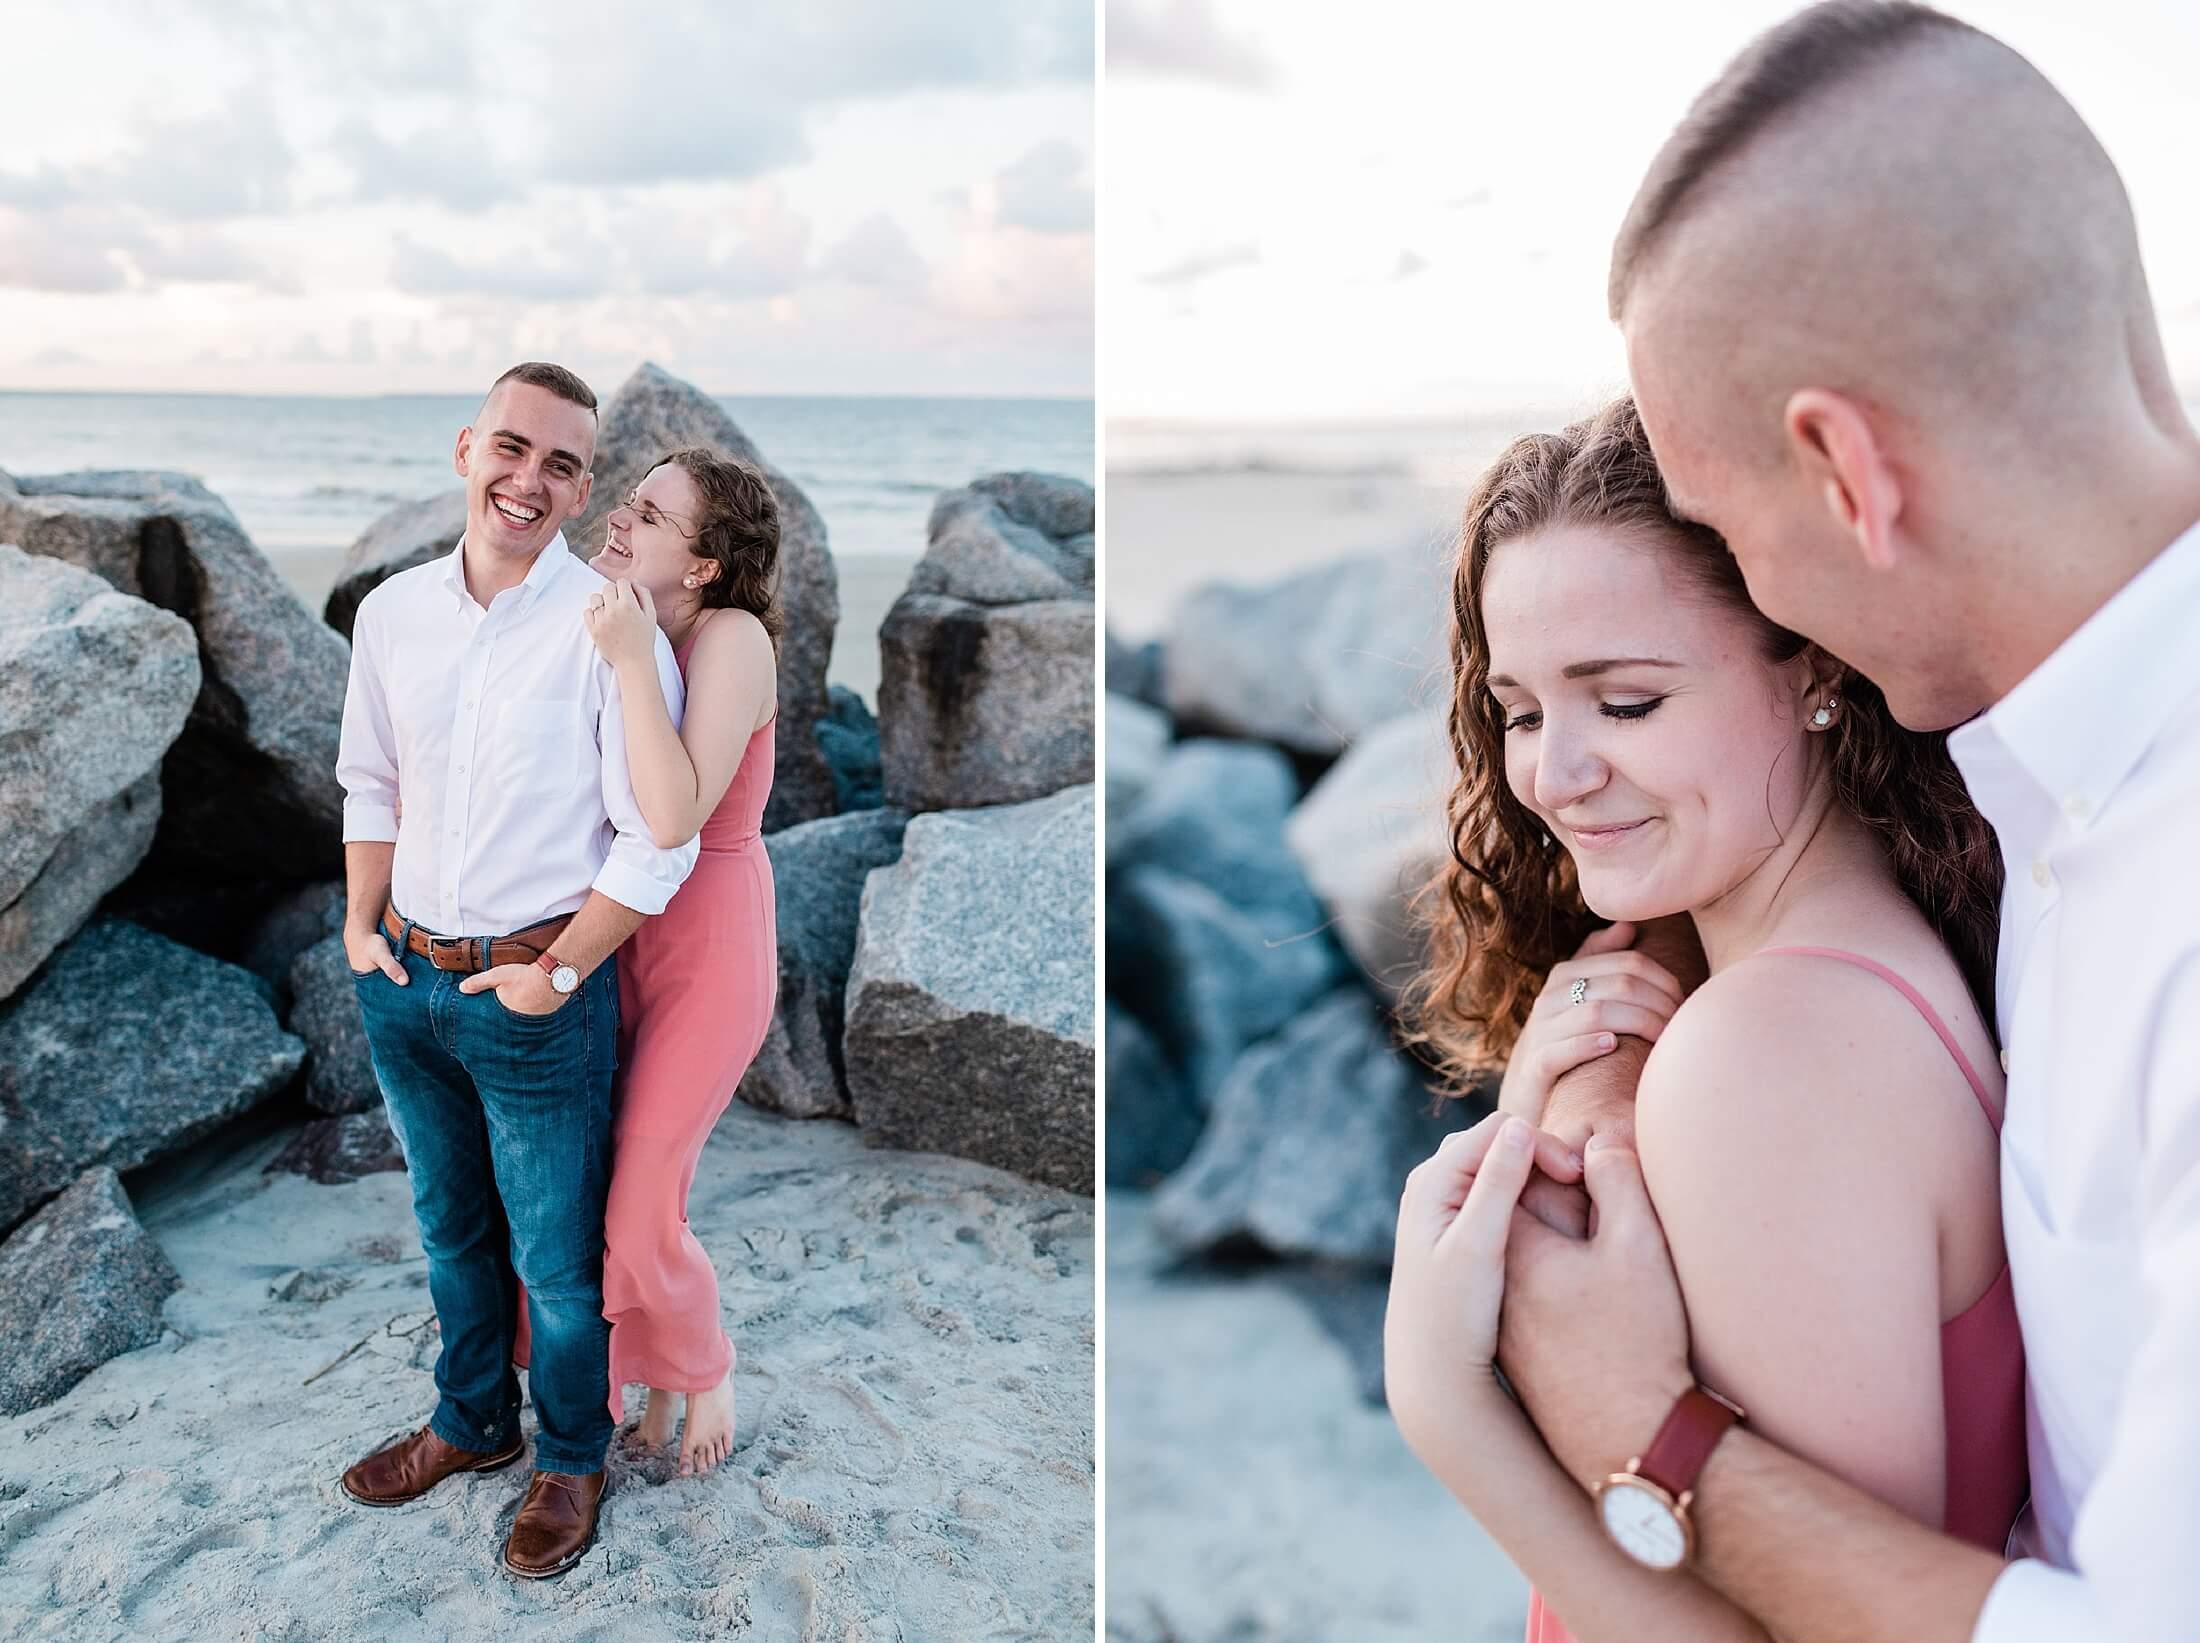 Apt-b-photography-savannah-engagement-photographer-savannah-wedding-hilton-head-elopement-savannah-wedding-photographer-5.jpg